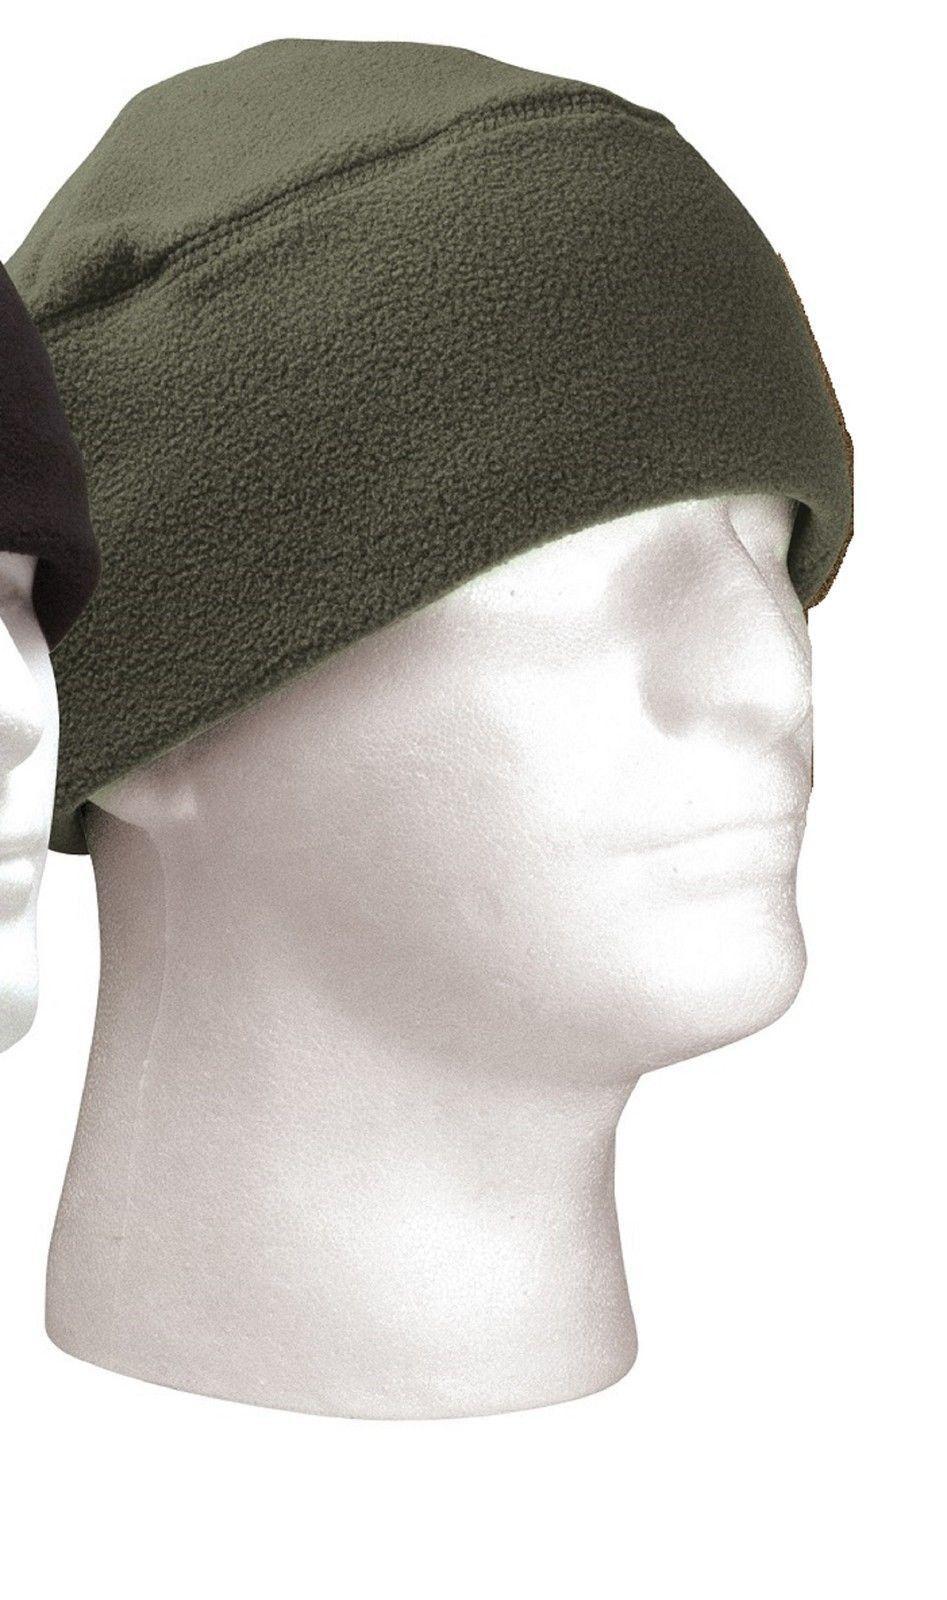 Polar Fleece Military Type Cold Weather Watch Cap Tactical Winter ... 47395aa52502